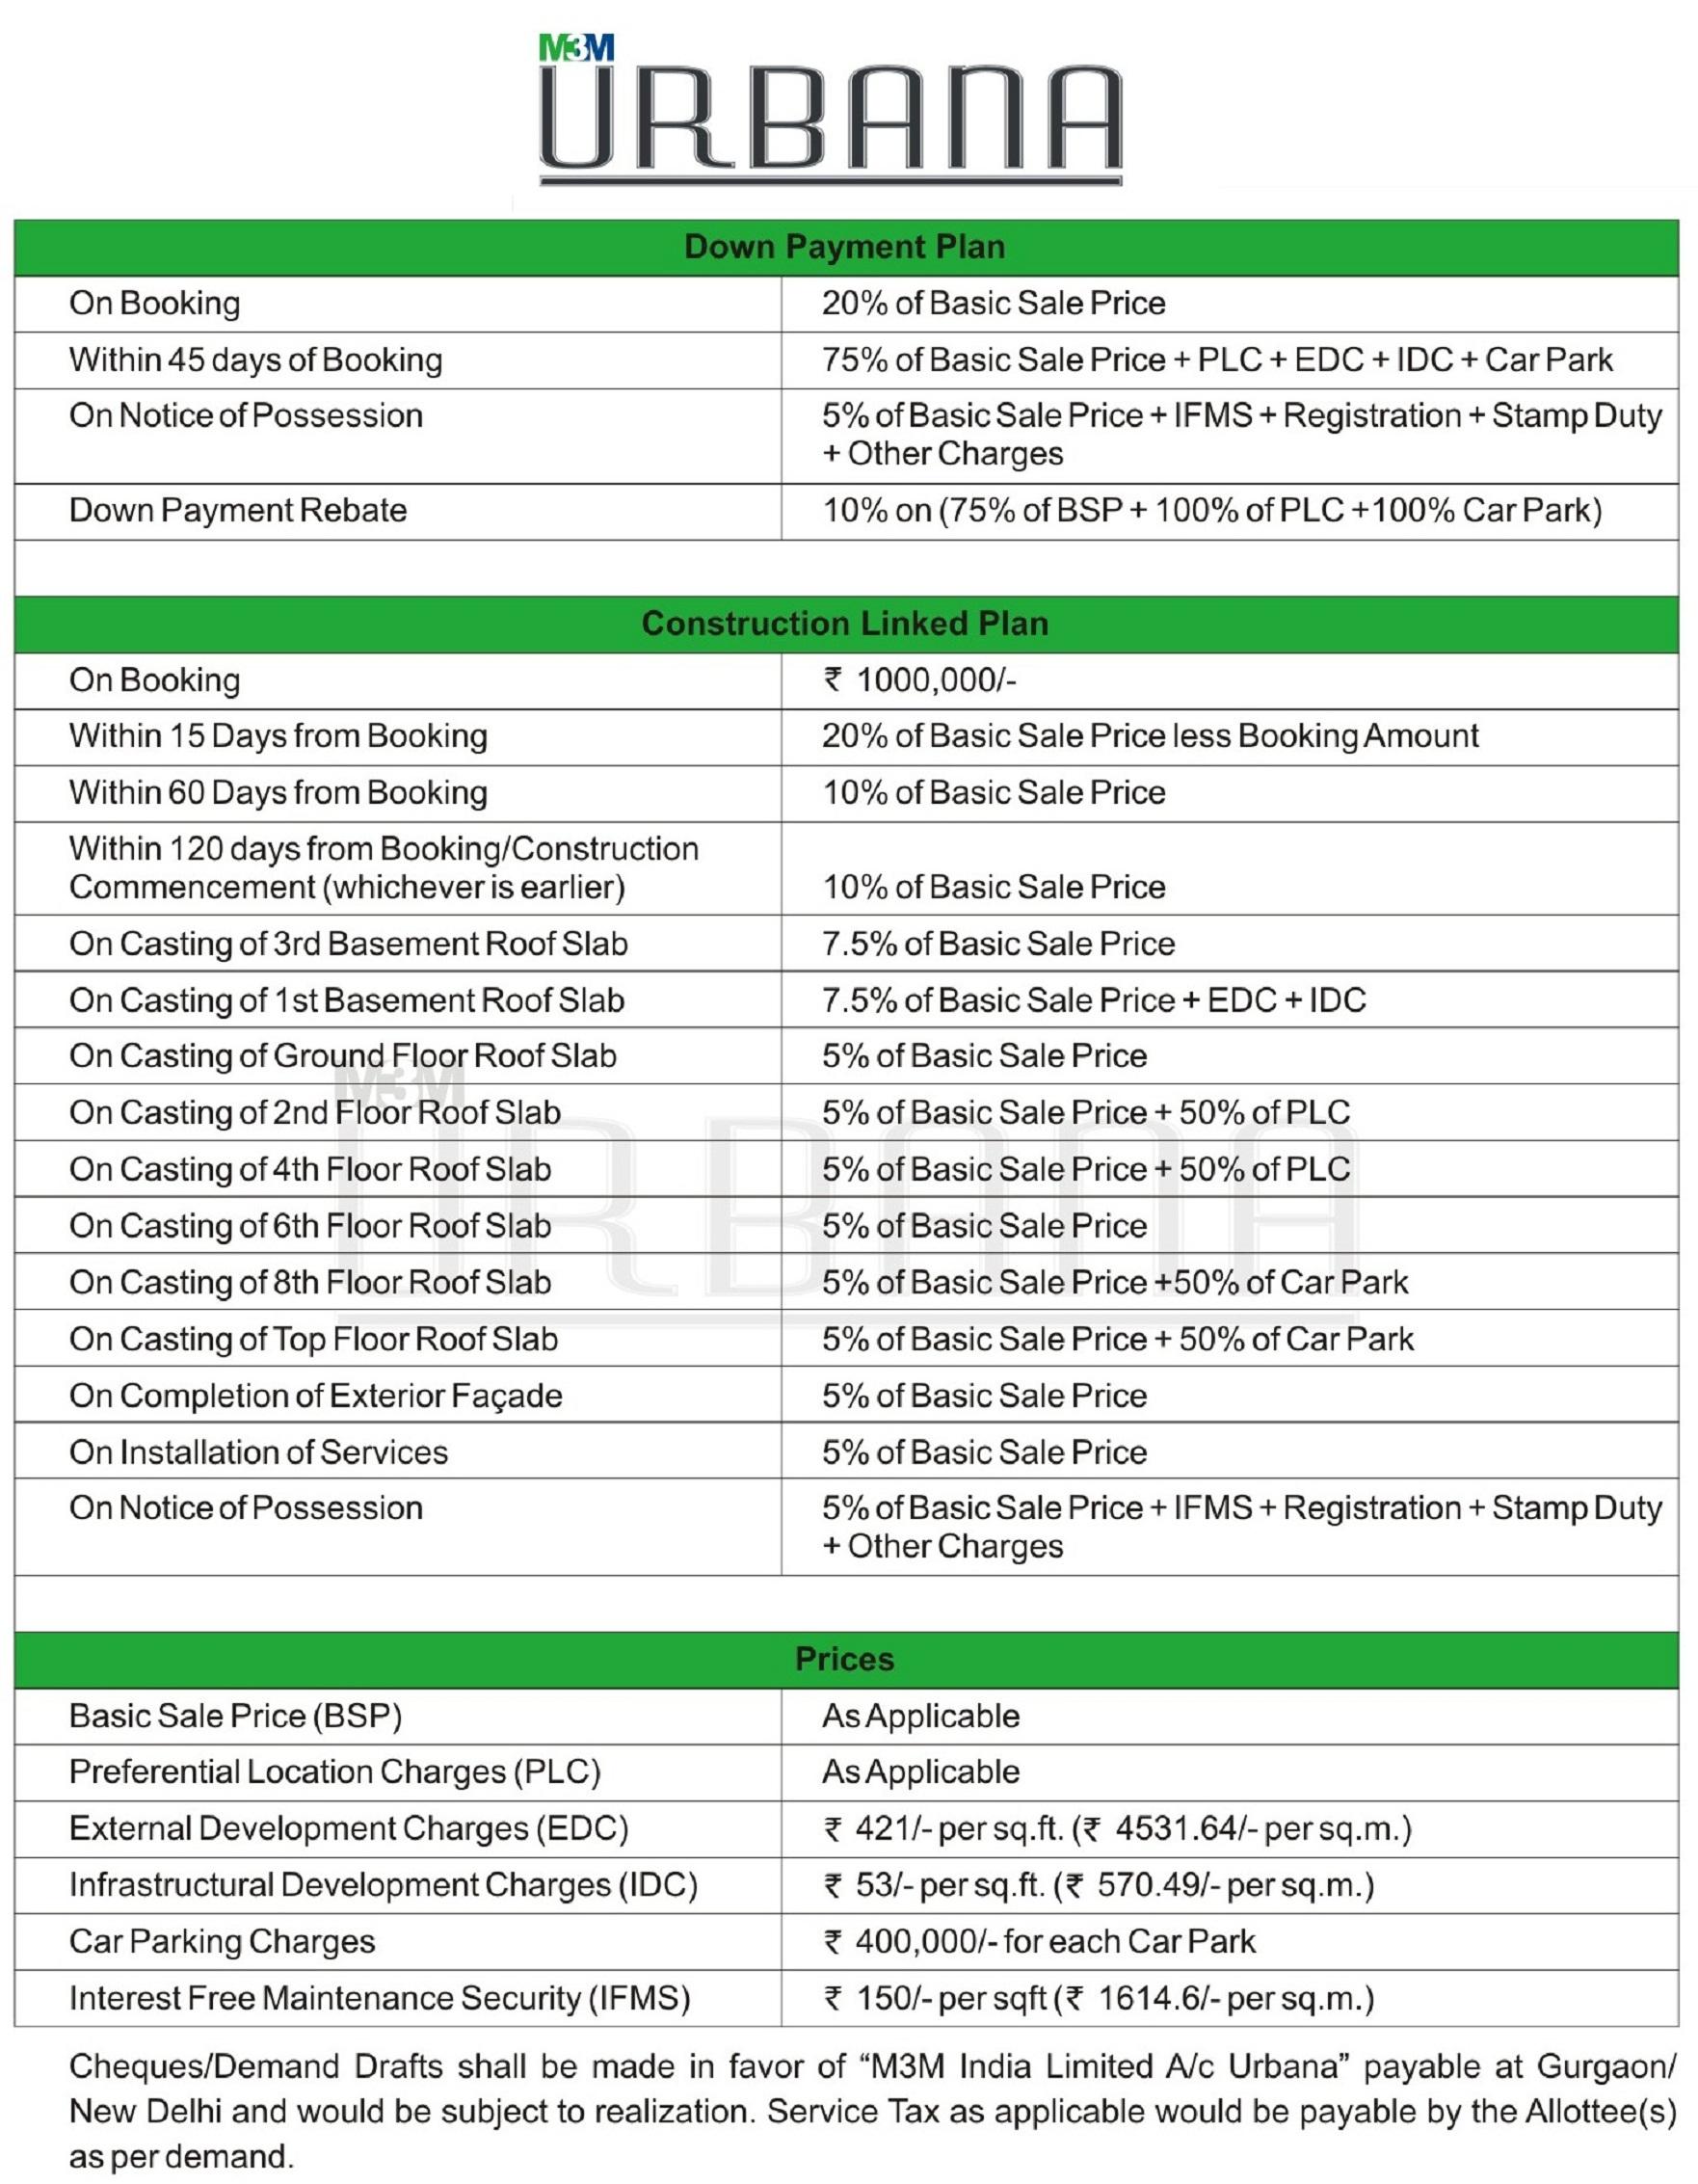 M3M Urbana Payment Plan